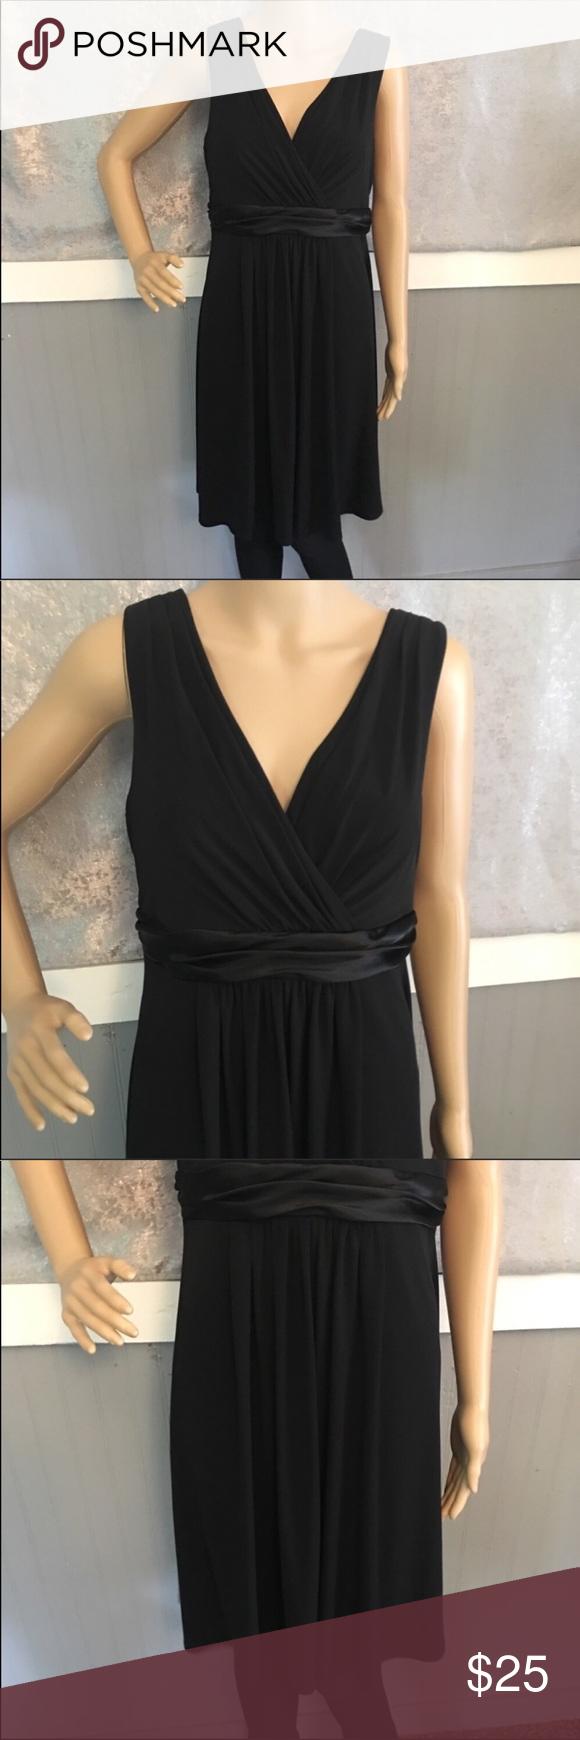 David S Bridal Knee Length Dress Size 12 E44239 David S Bridal Knee Length Sleeveless Jersey Dress W Black Knee Length Dress Black Dress Black Sleeveless Dress [ 1740 x 580 Pixel ]